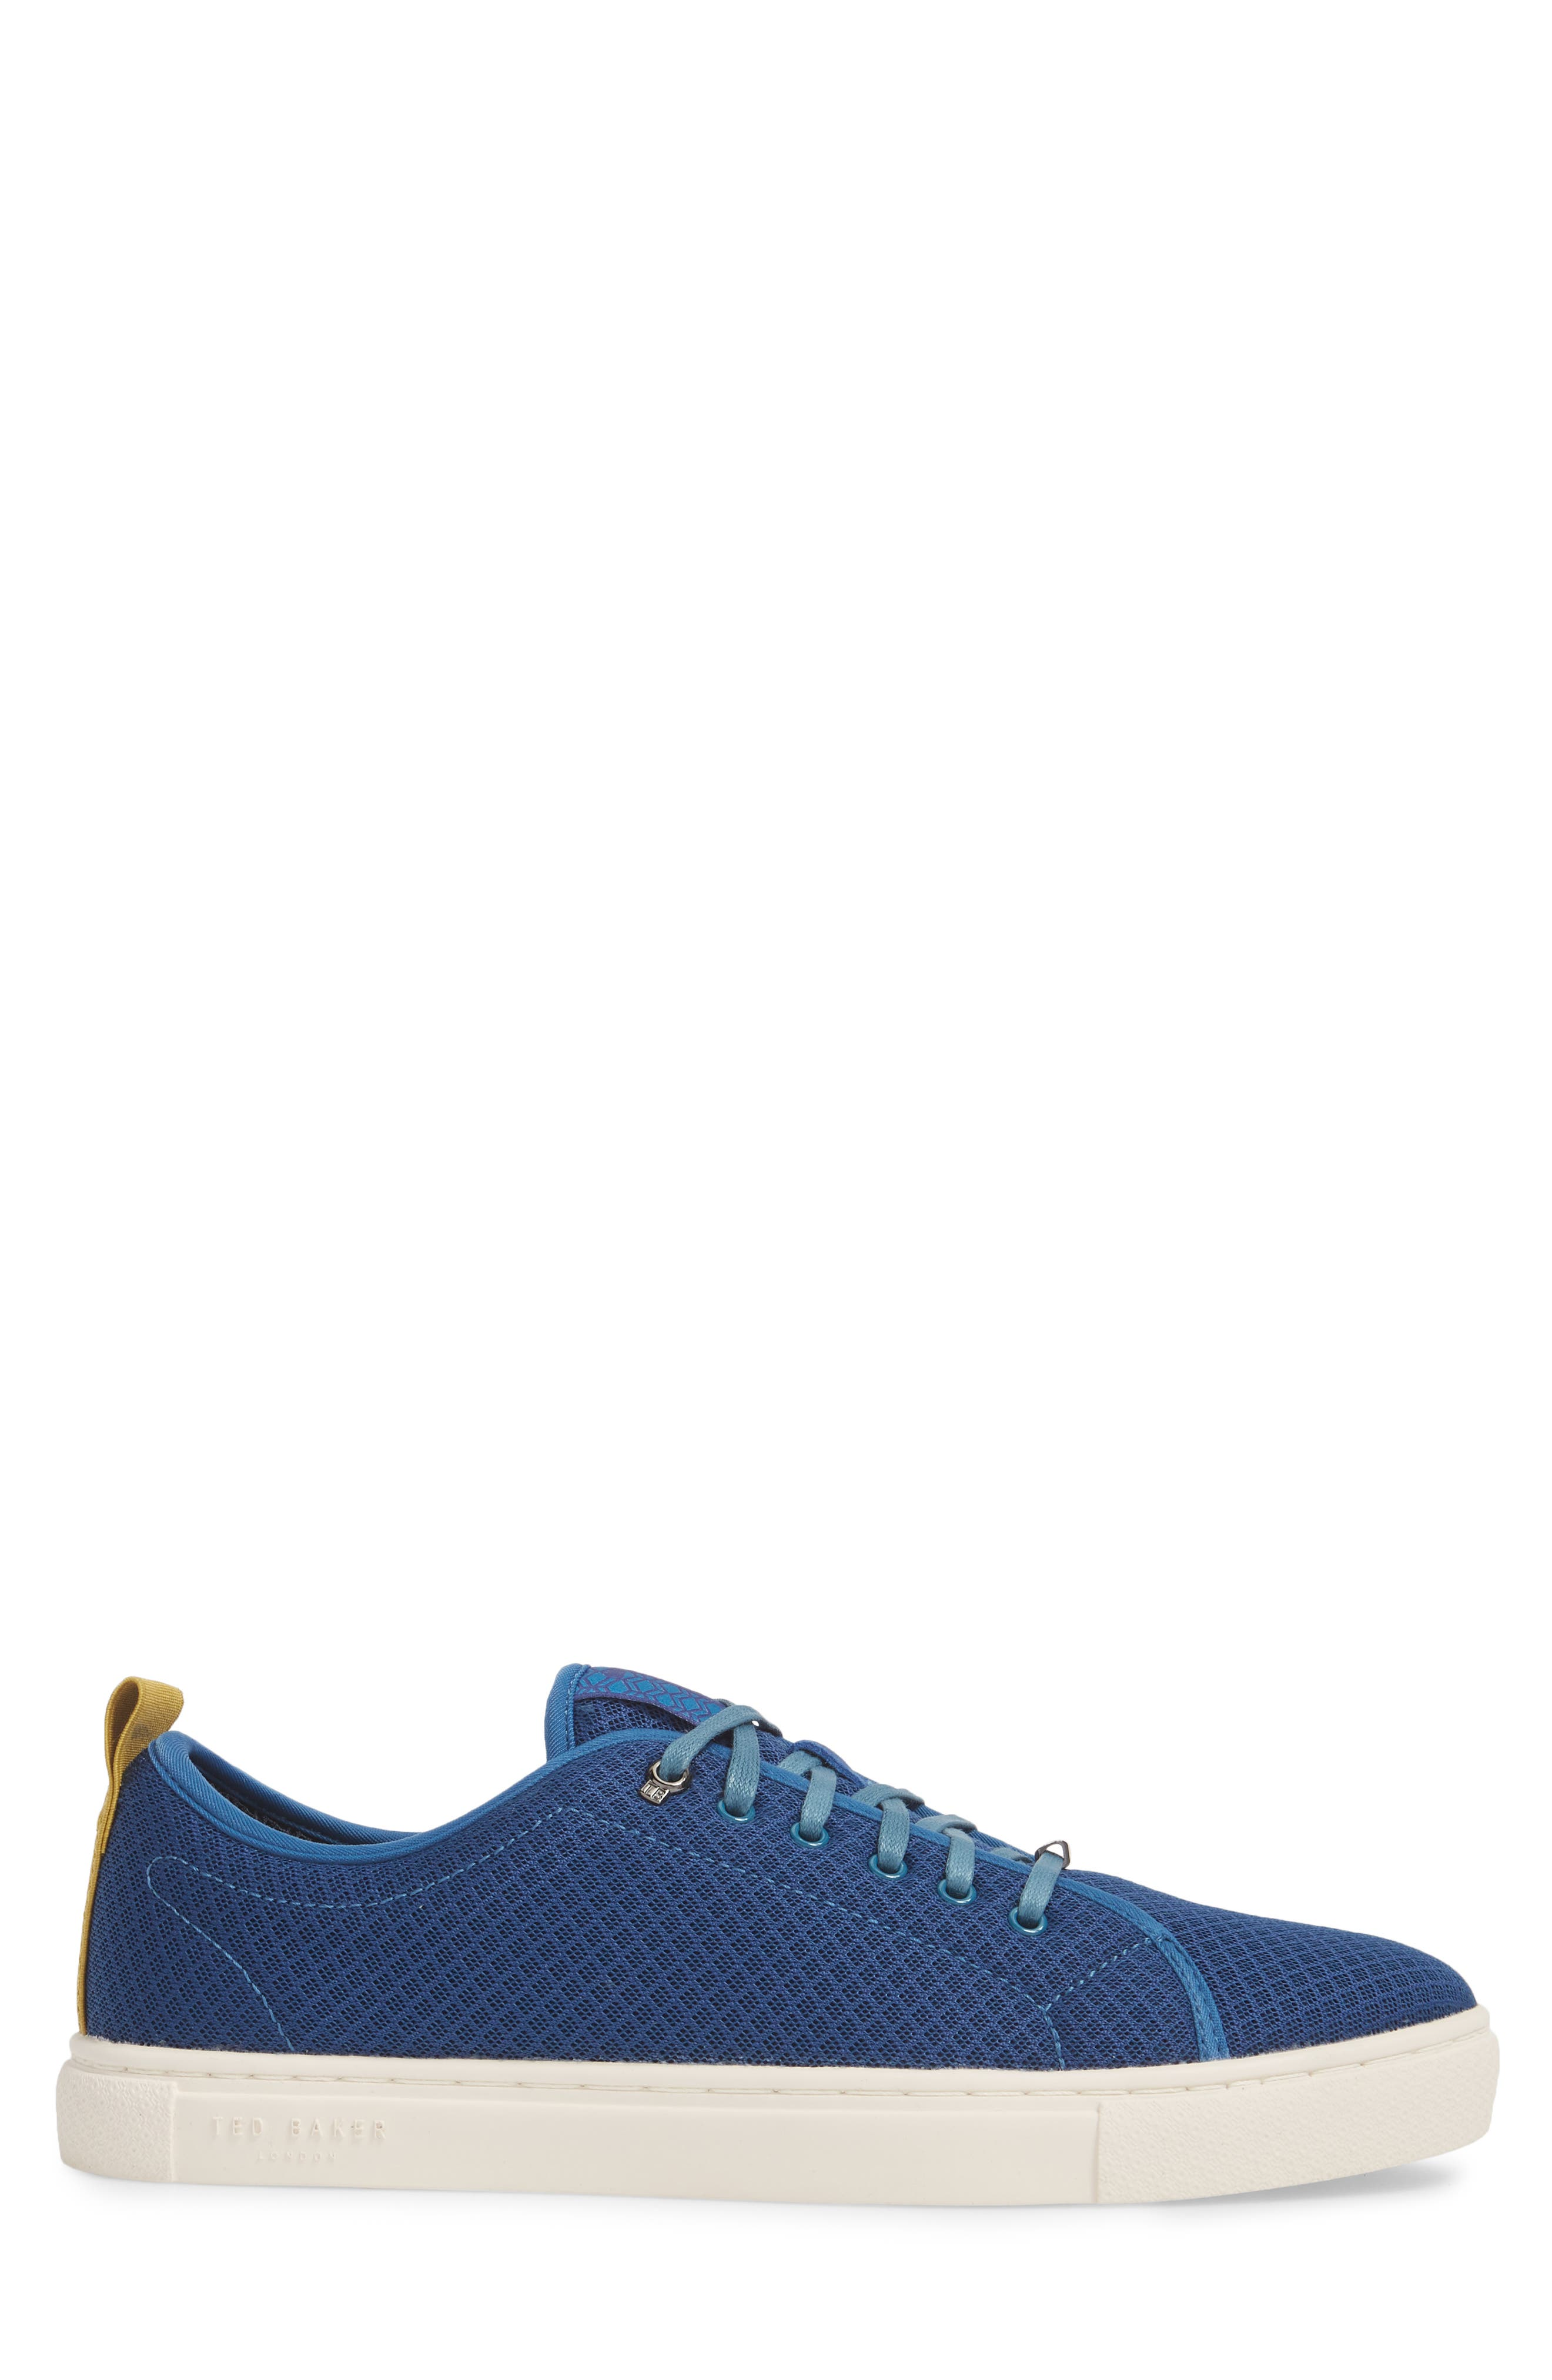 Lannse Low Top Mesh Sneaker,                             Alternate thumbnail 3, color,                             454